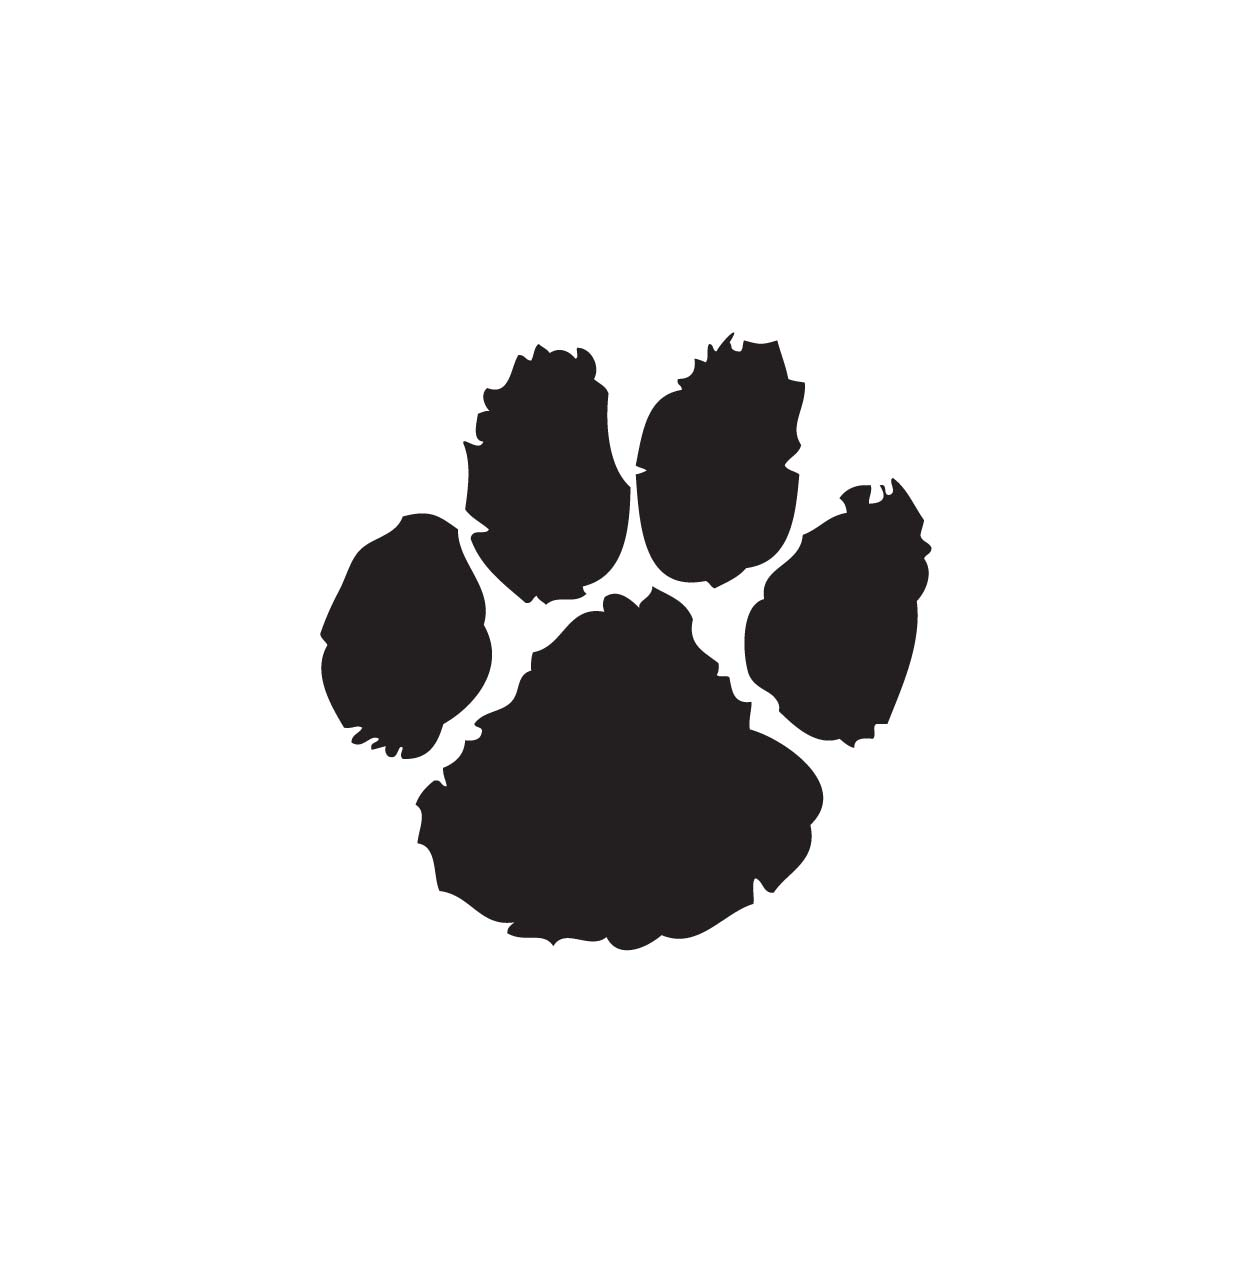 Green Dog Paw Clip Art Clipart Panda Fre-Green Dog Paw Clip Art Clipart Panda Free Clipart Images-8